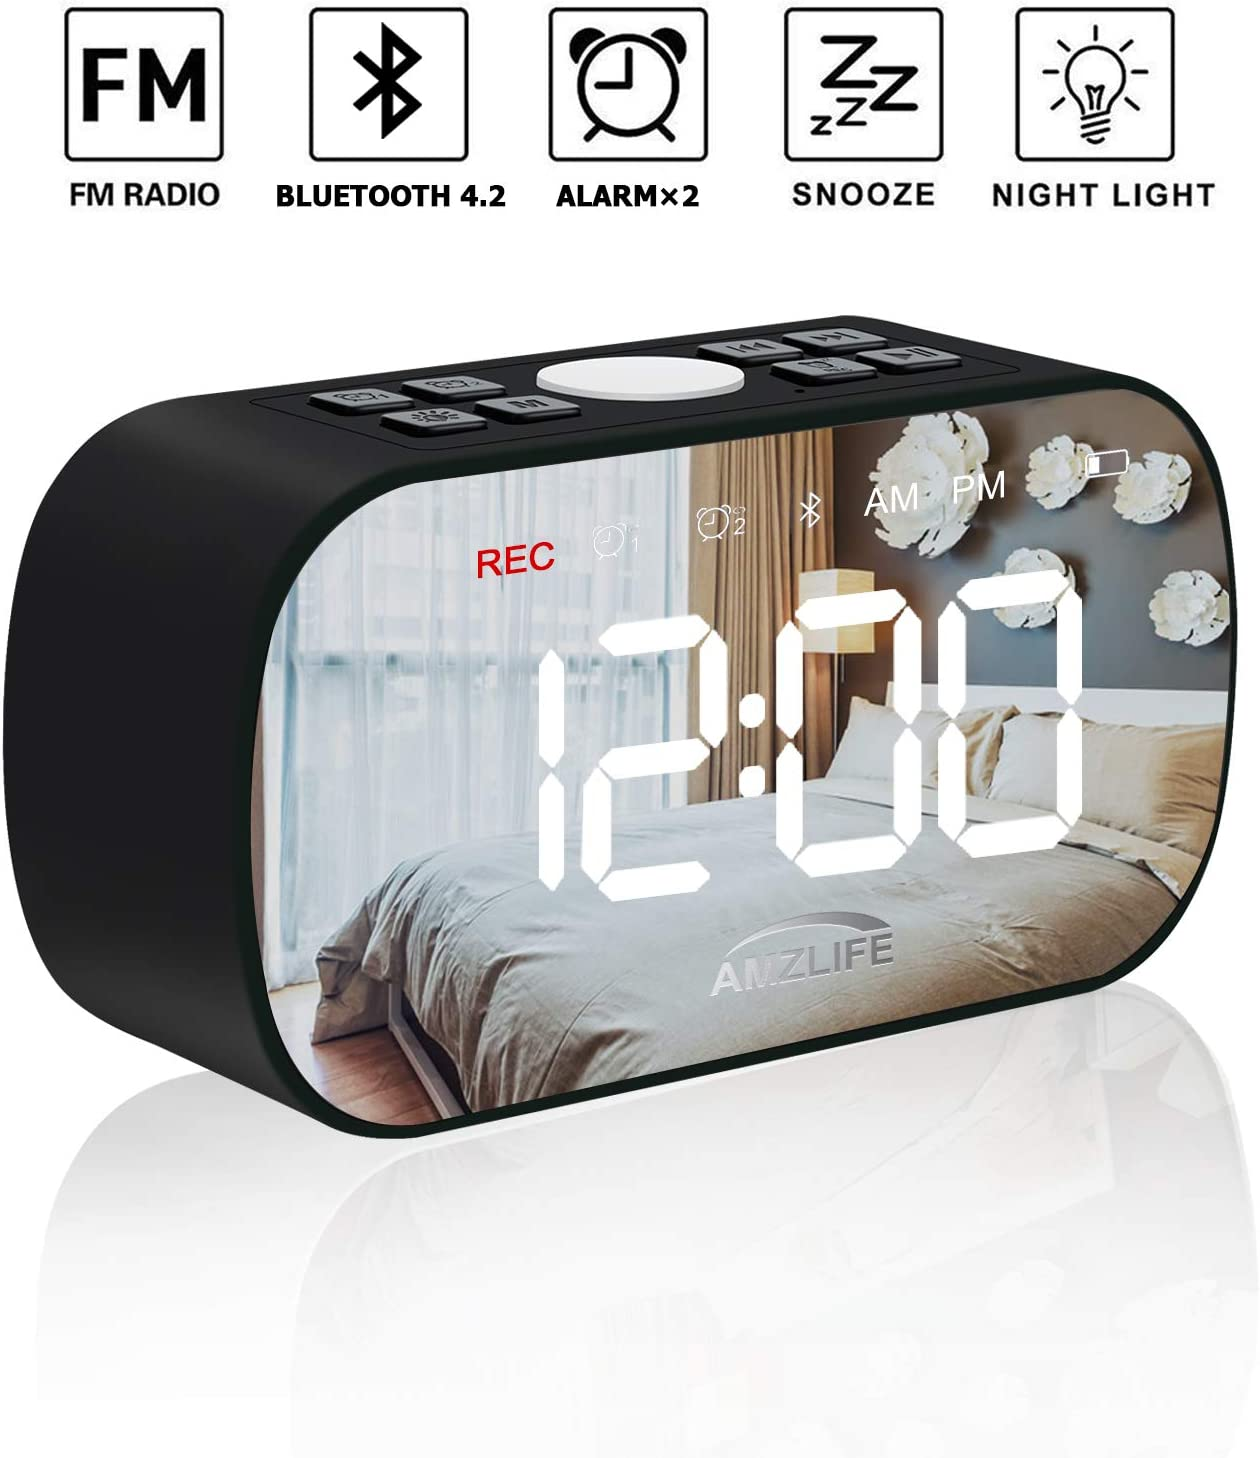 AMZLIFE Alarm Clock Radio with Wireless Bluetooth Speaker FM Radio